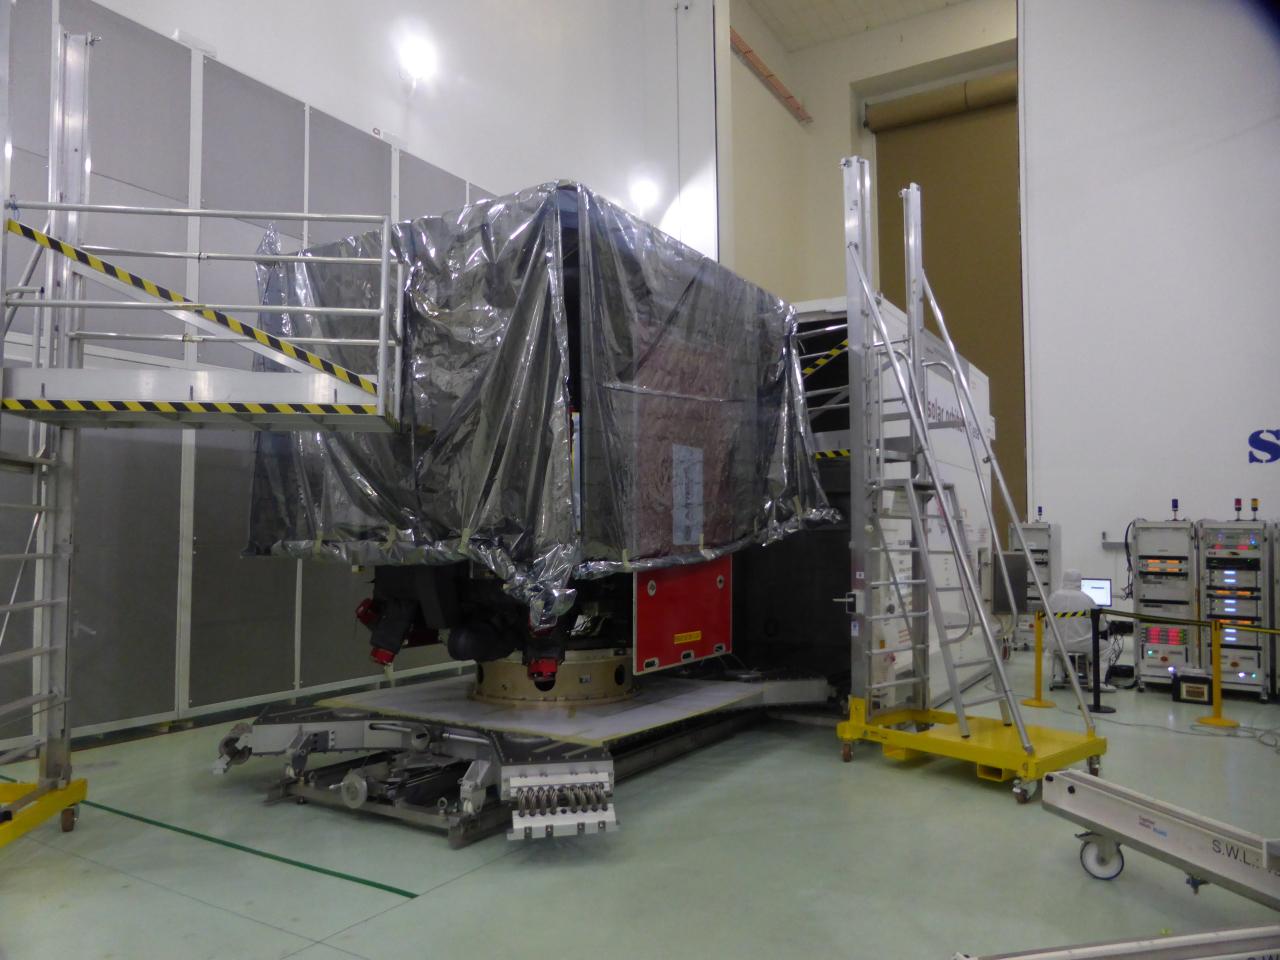 Solar_Orbiter_launch_campaign_begins_2_1280.jpg